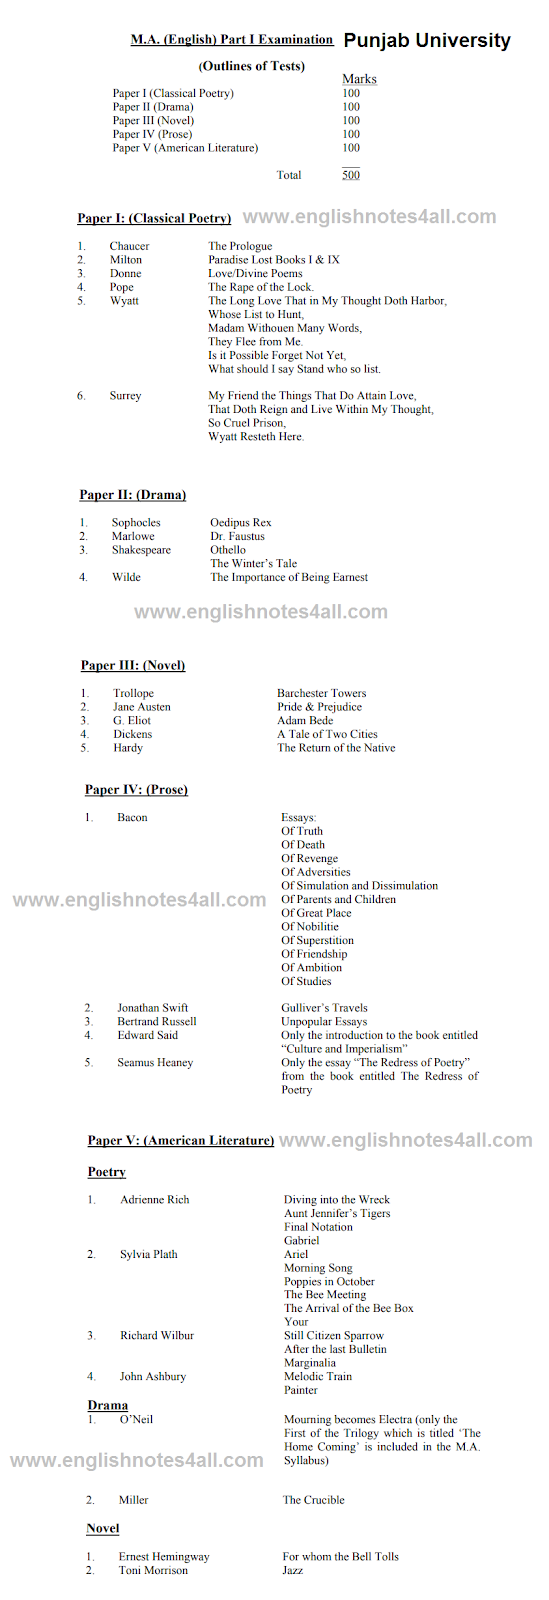 Ma Part 1 Result 2019 Punjab University